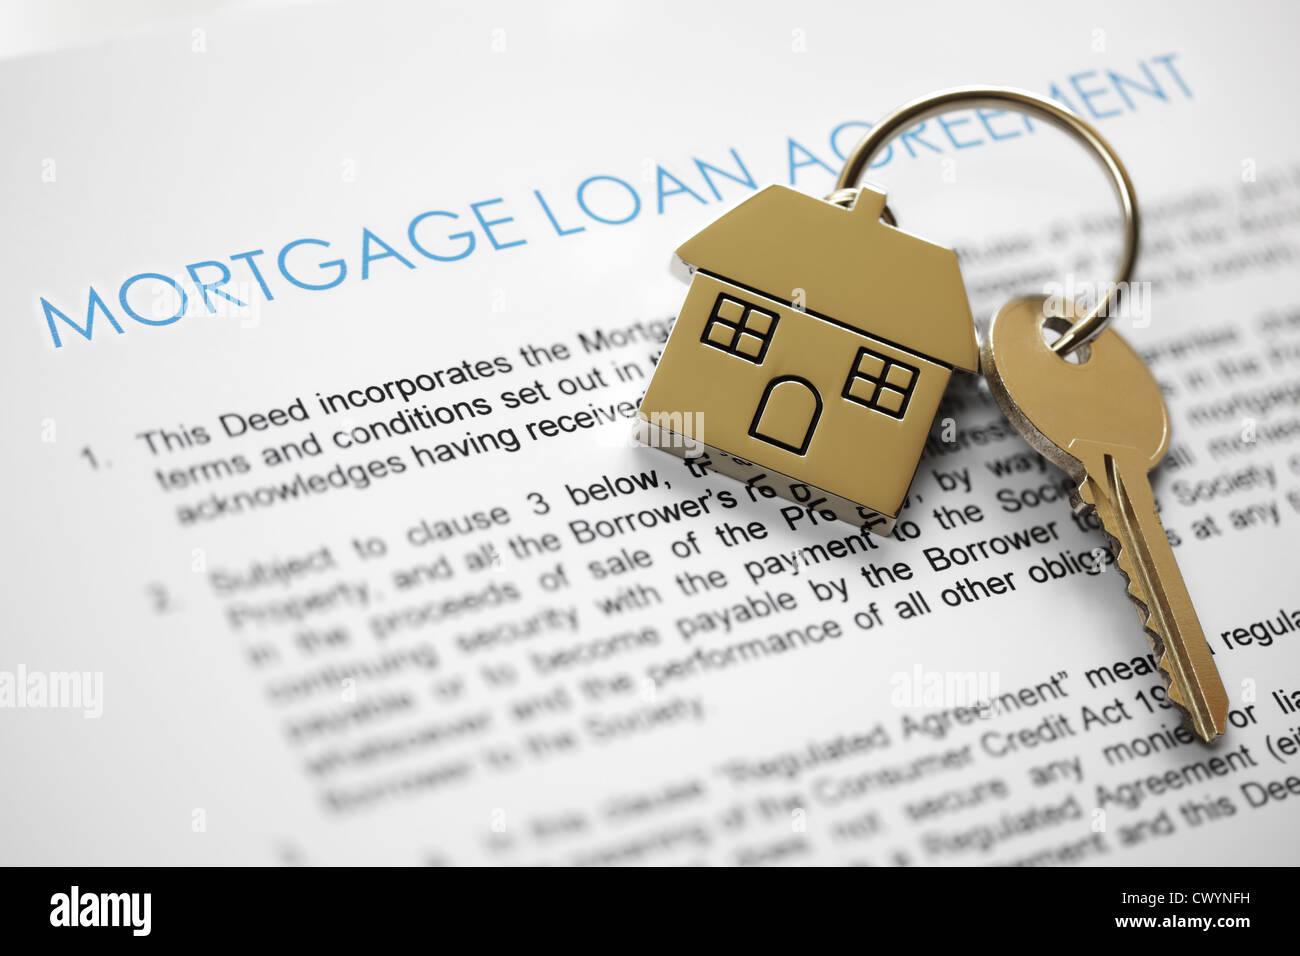 Mortgage application - Stock Image